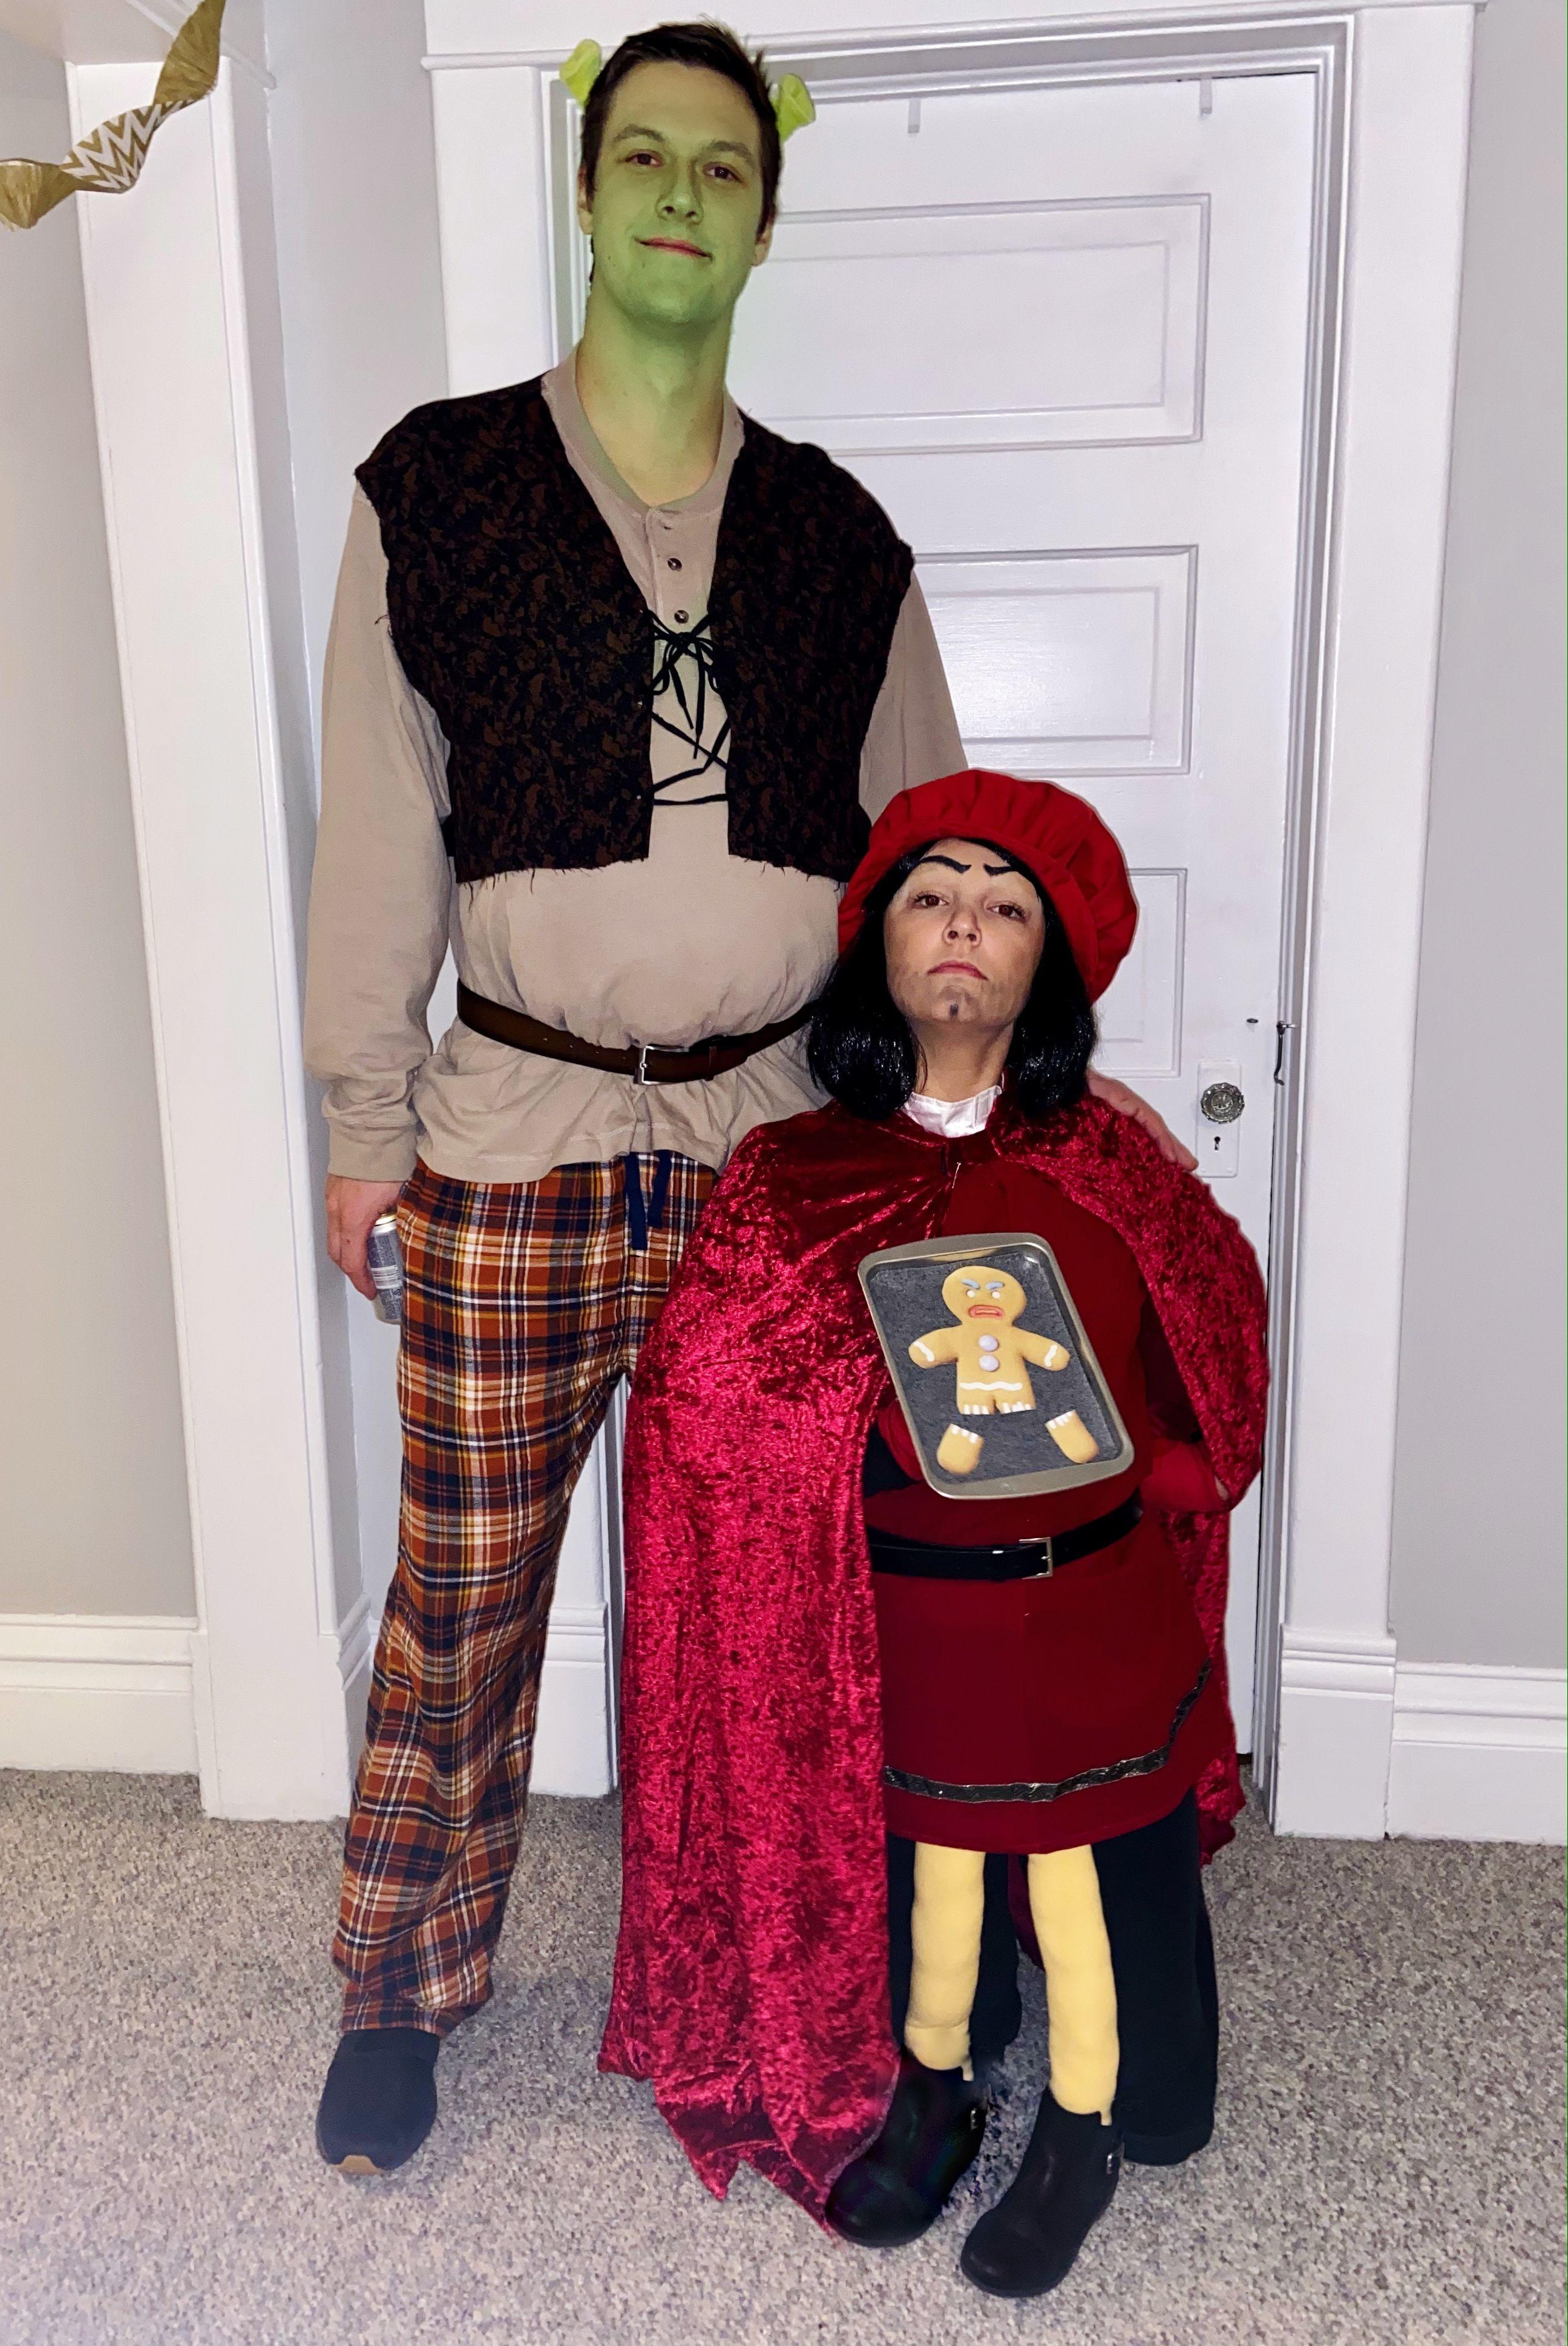 Halloween Shrek 2020 Shrek and Lord Farquaad halloween costume in 2020   Shrek